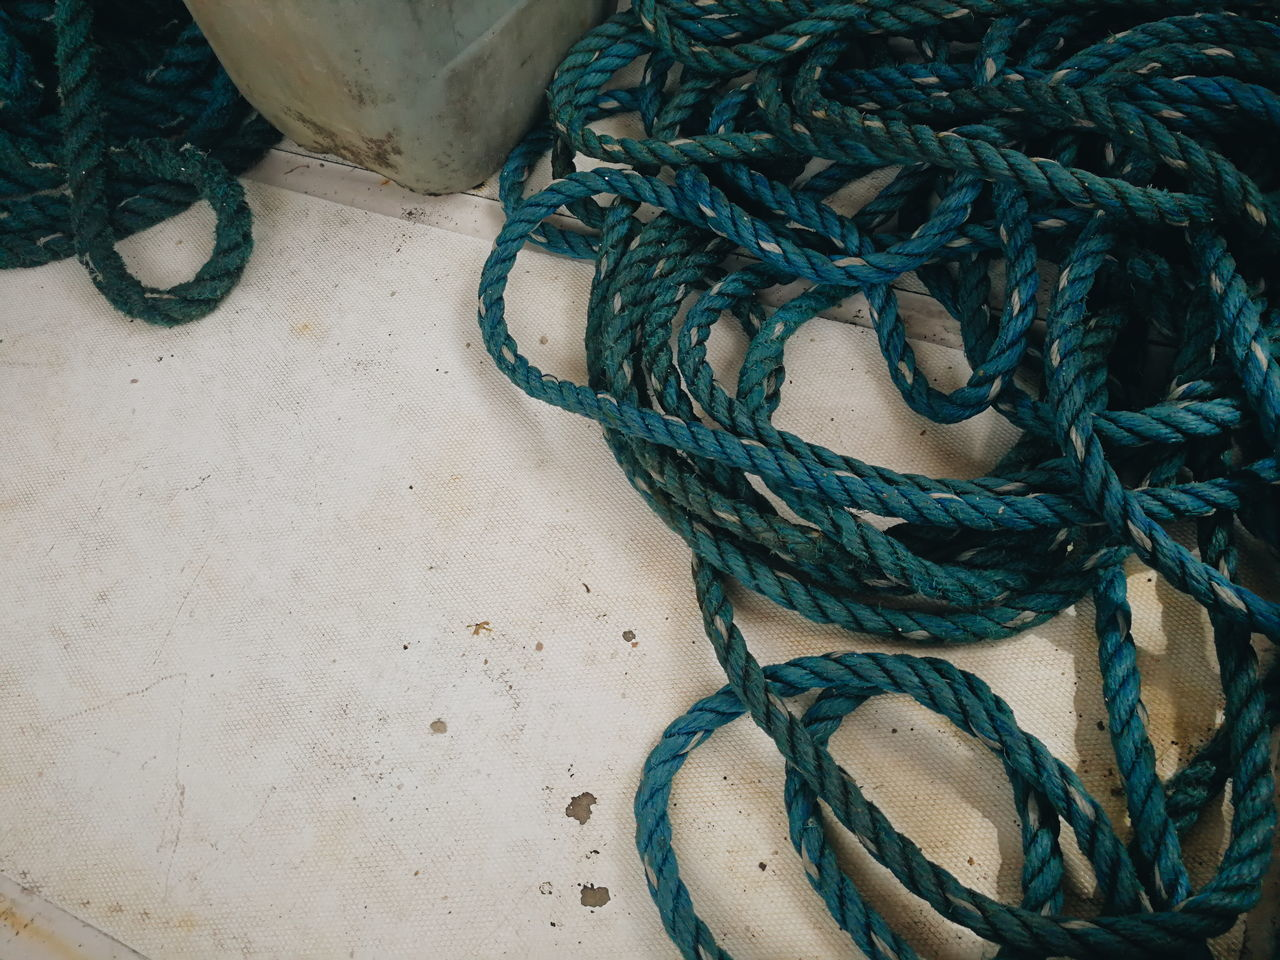 Tangle Rope Fishing Equipment Outdoors